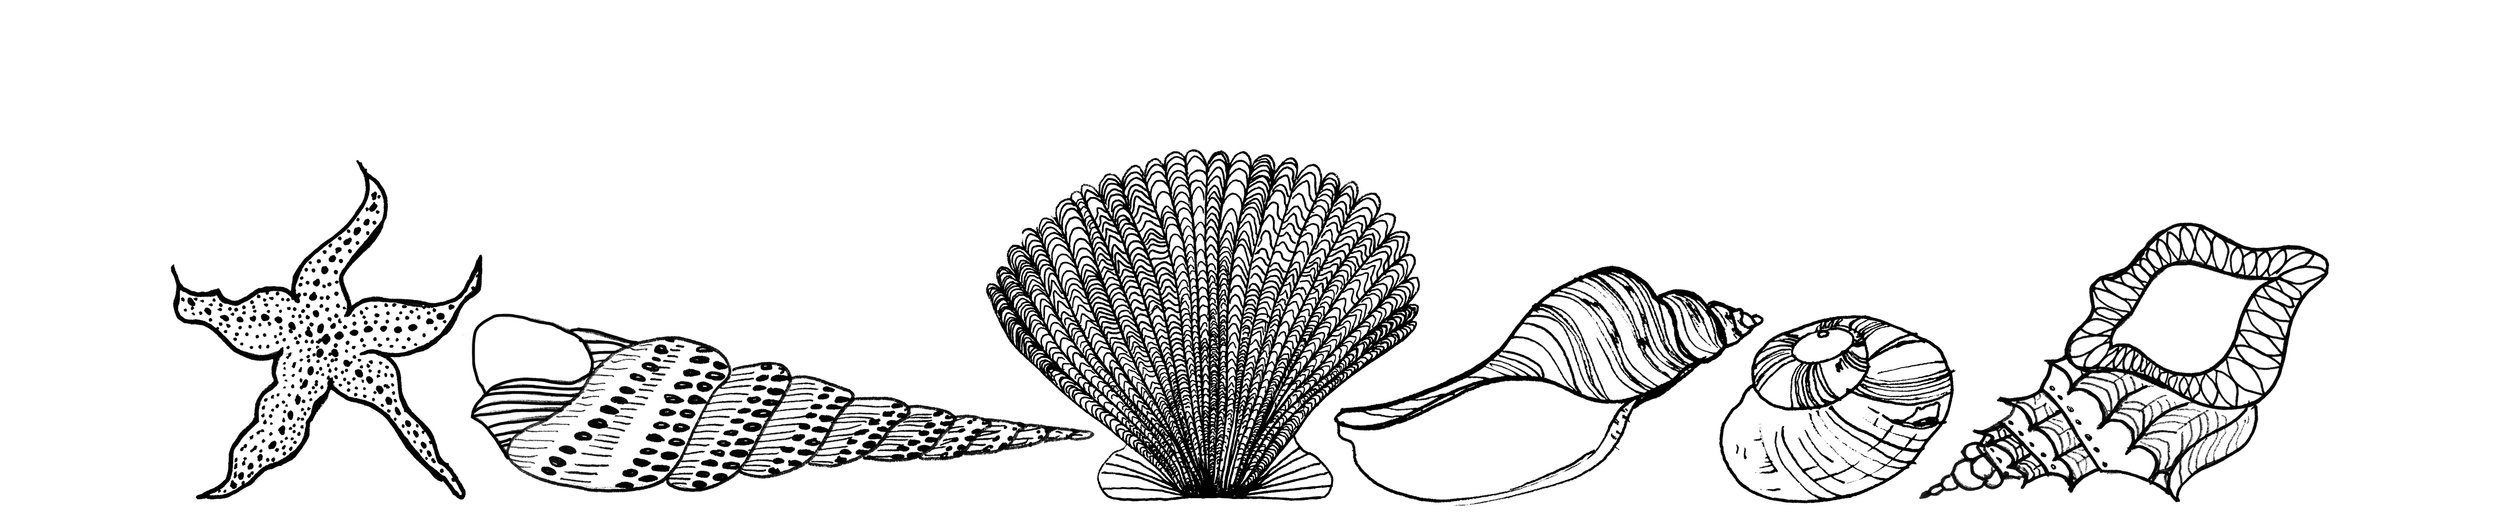 shellss.jpg